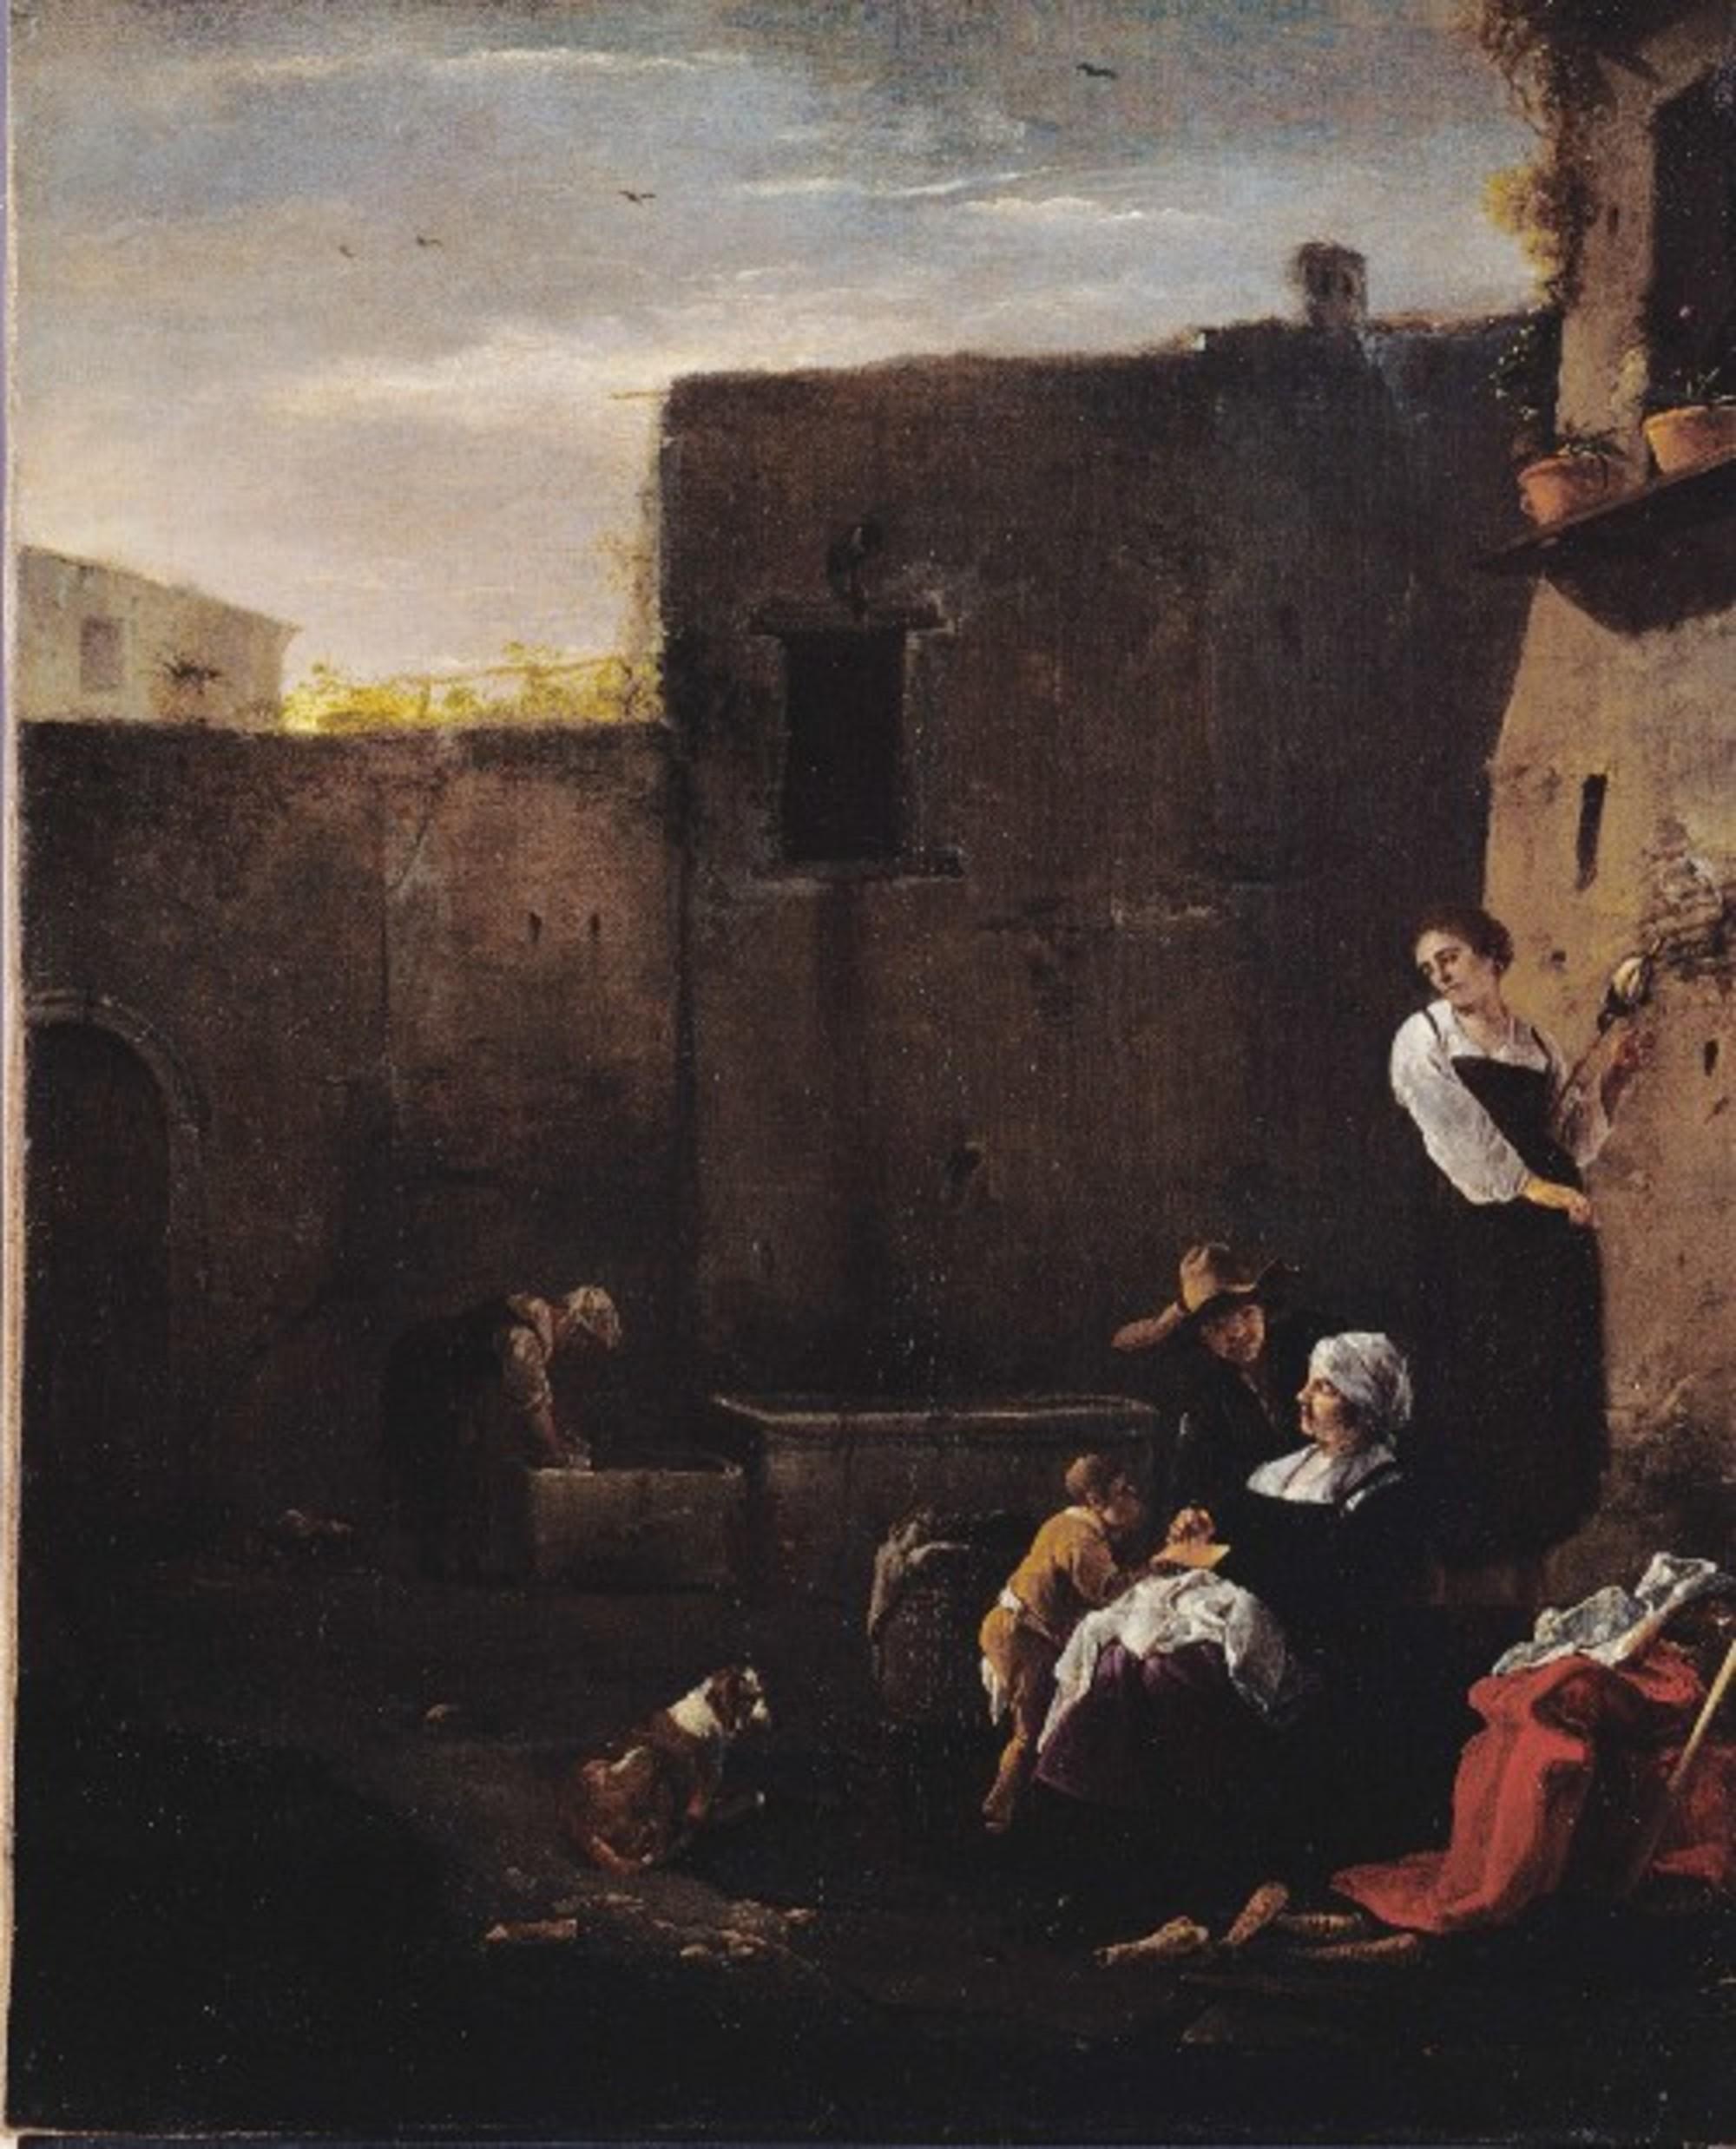 Wijck-Thomas---Italian-Courtyard---Google-Art-Project.jpg